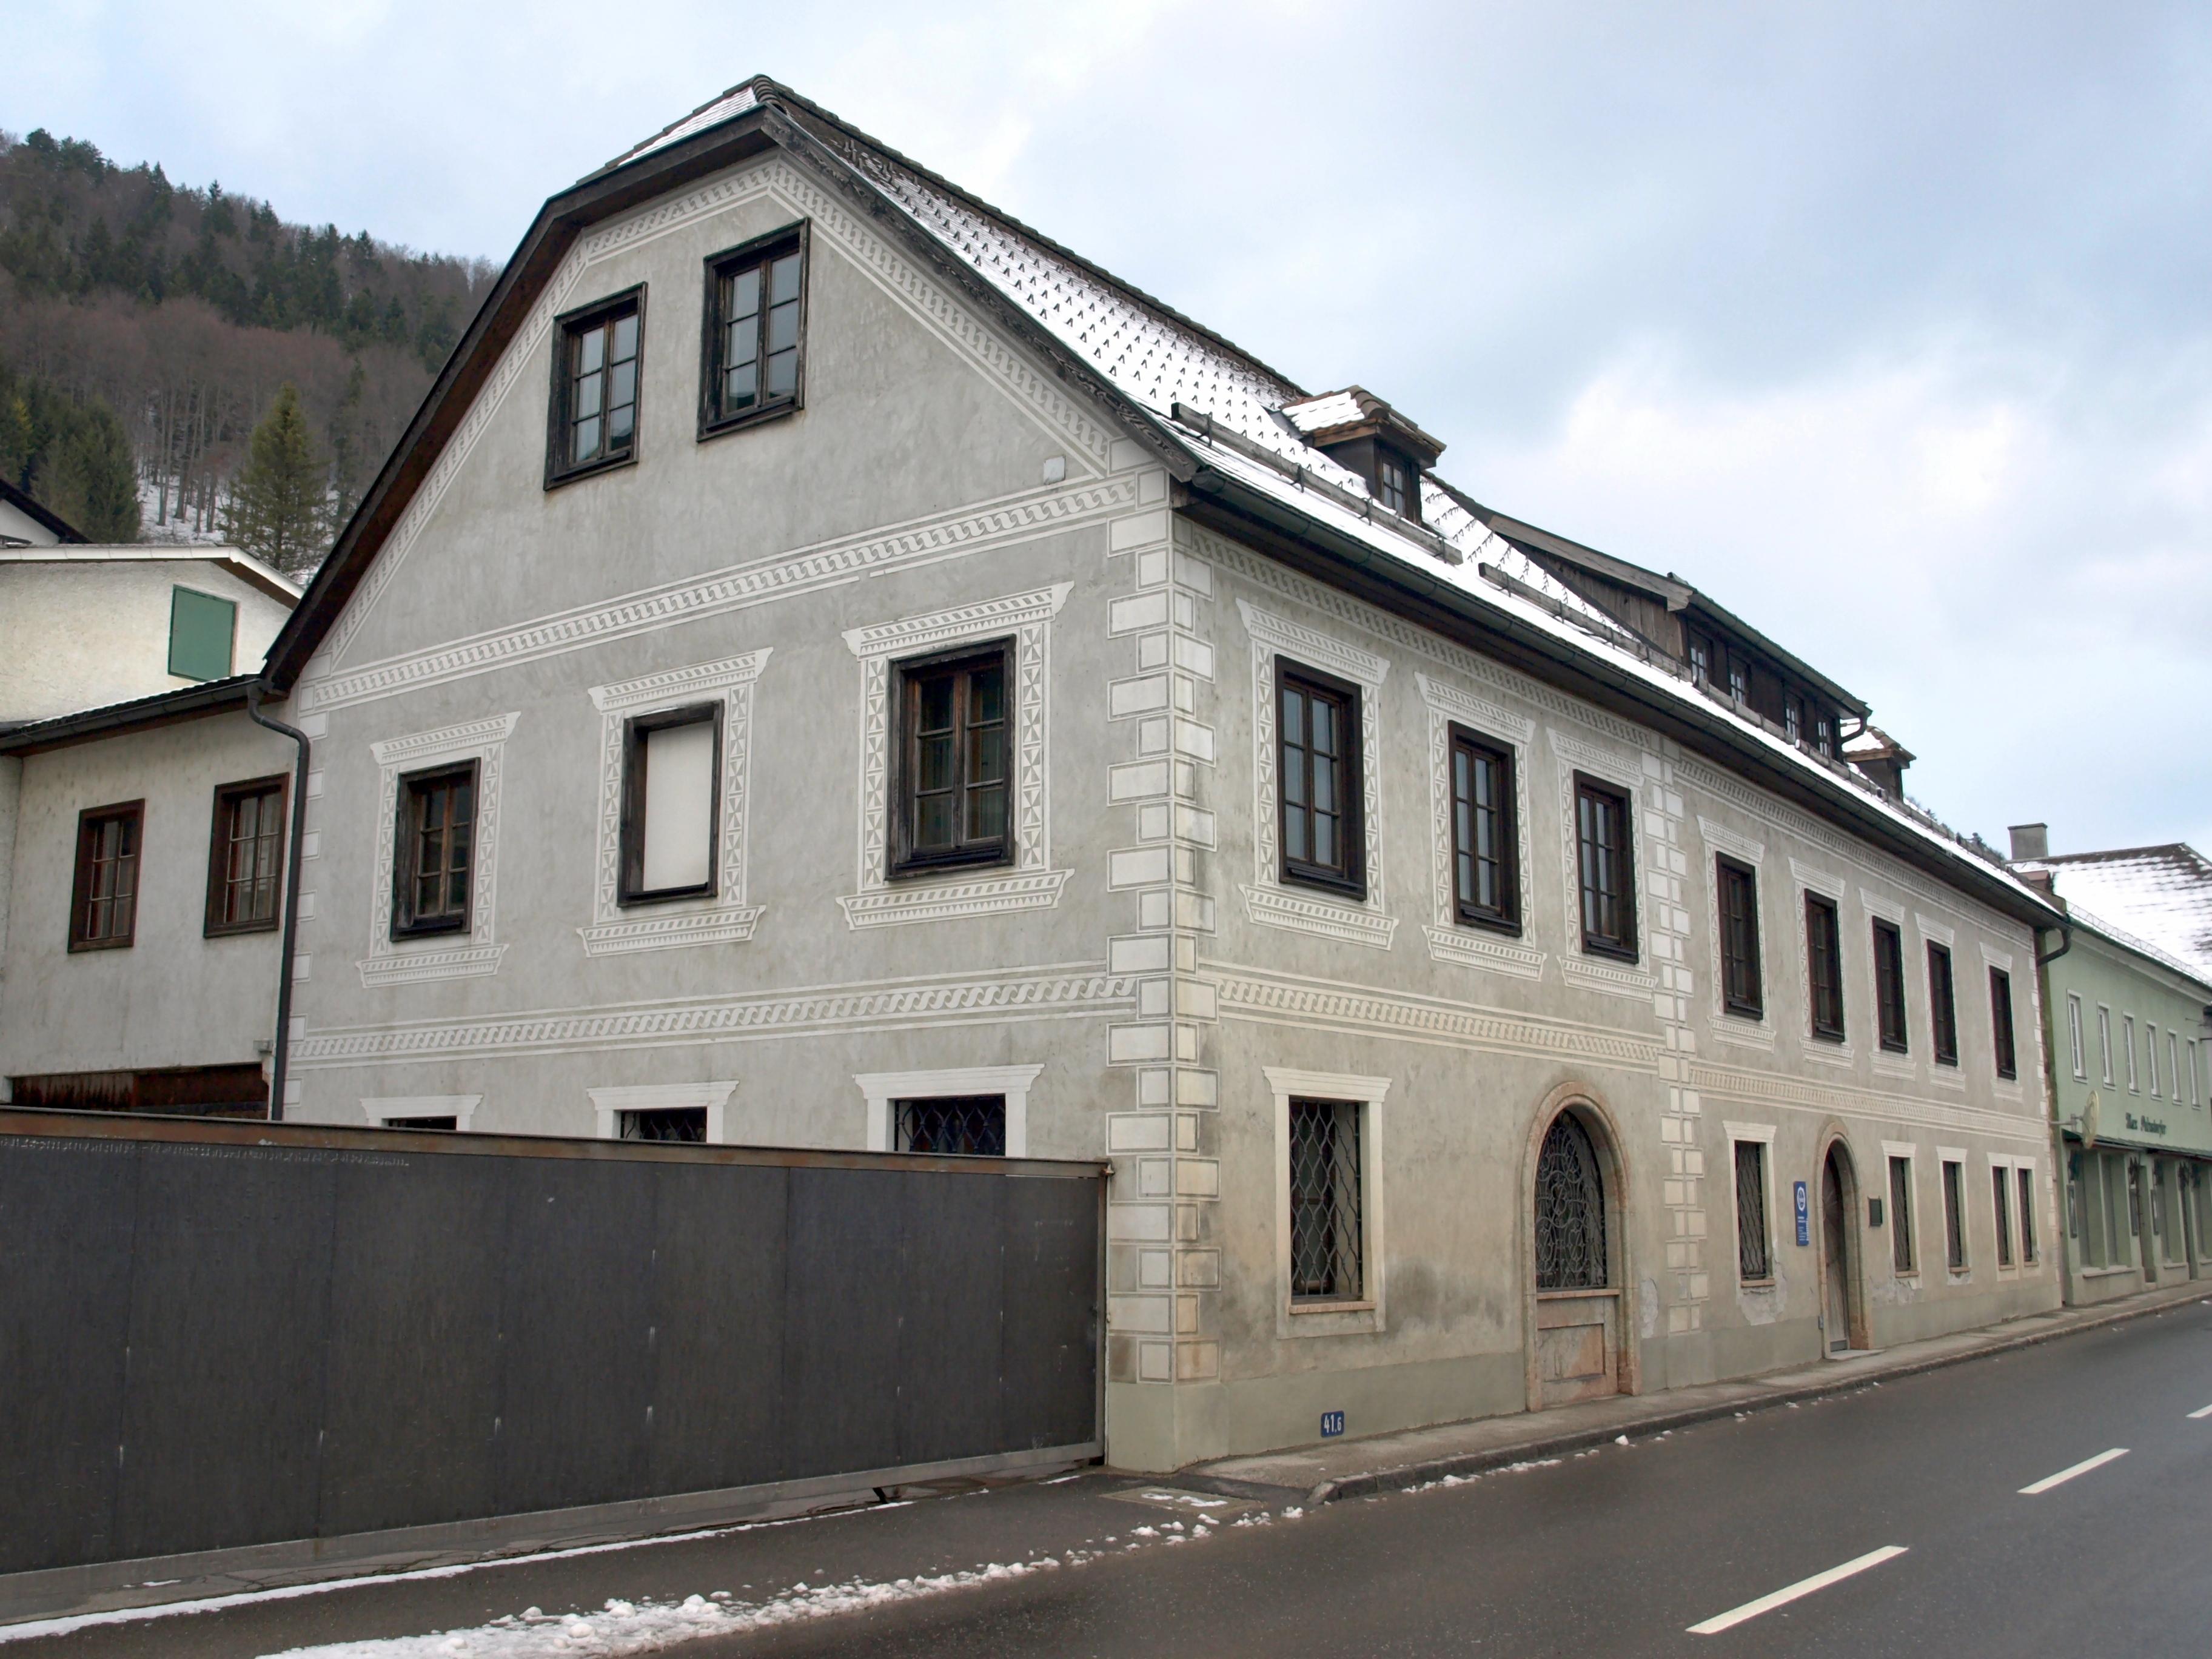 File:2012.01.15 - Weyer62 - Bürgerhaus, Wachszieherhaus ...